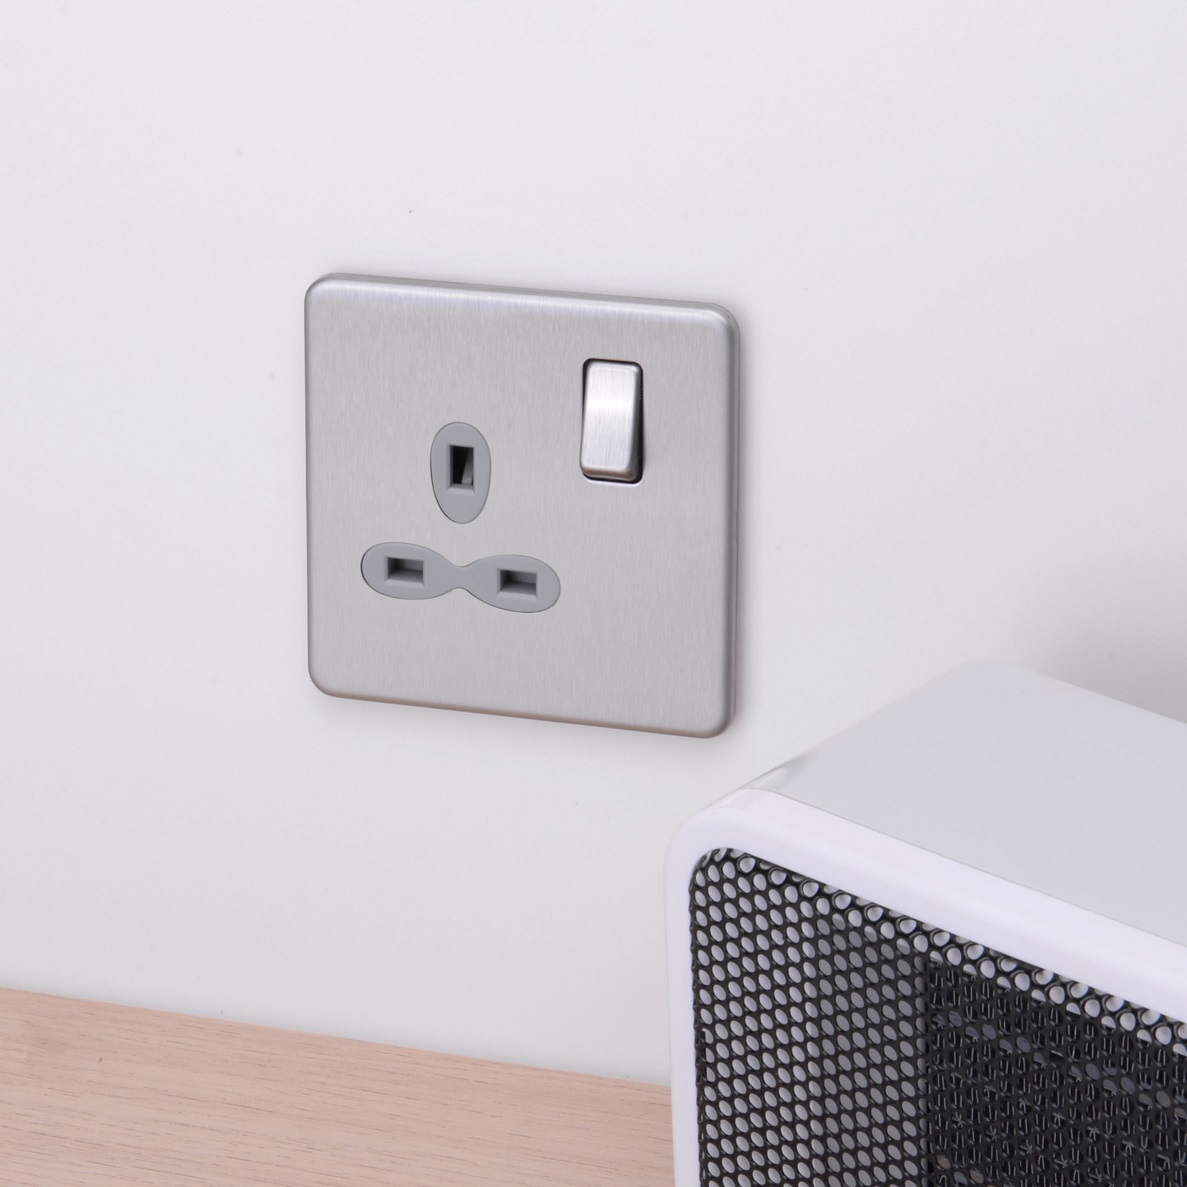 Slimline Screwless 1G DP Switched Single Socket